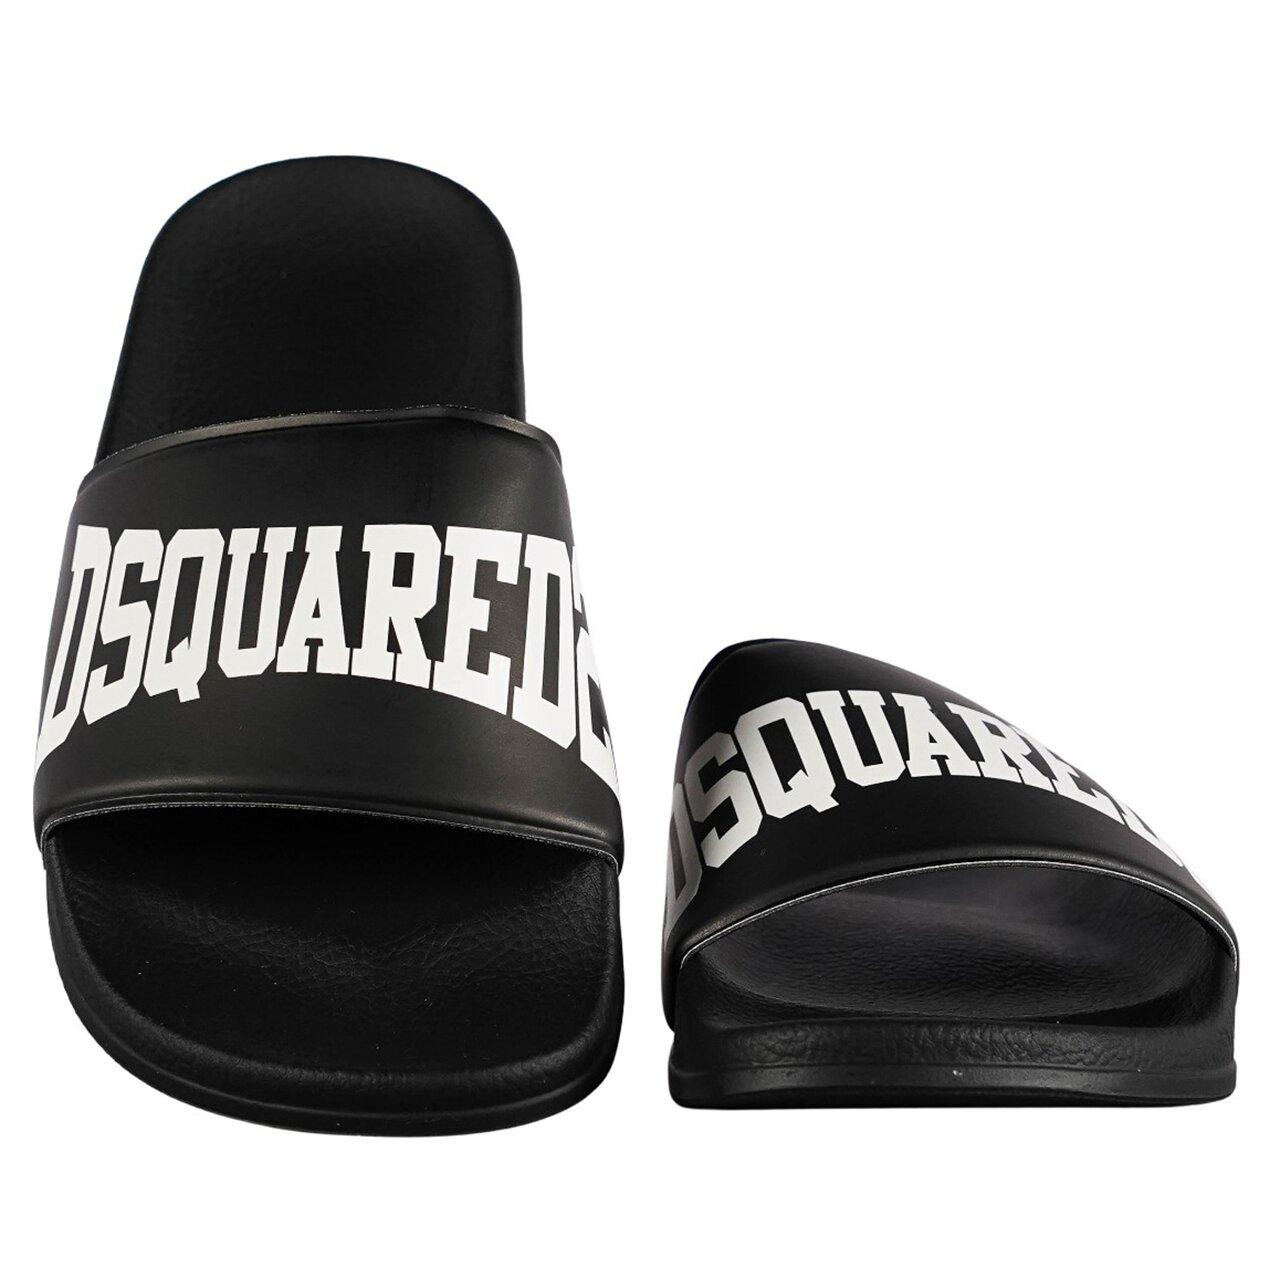 Dsquared² Badslippers Zwart met Wit logo DQ0330